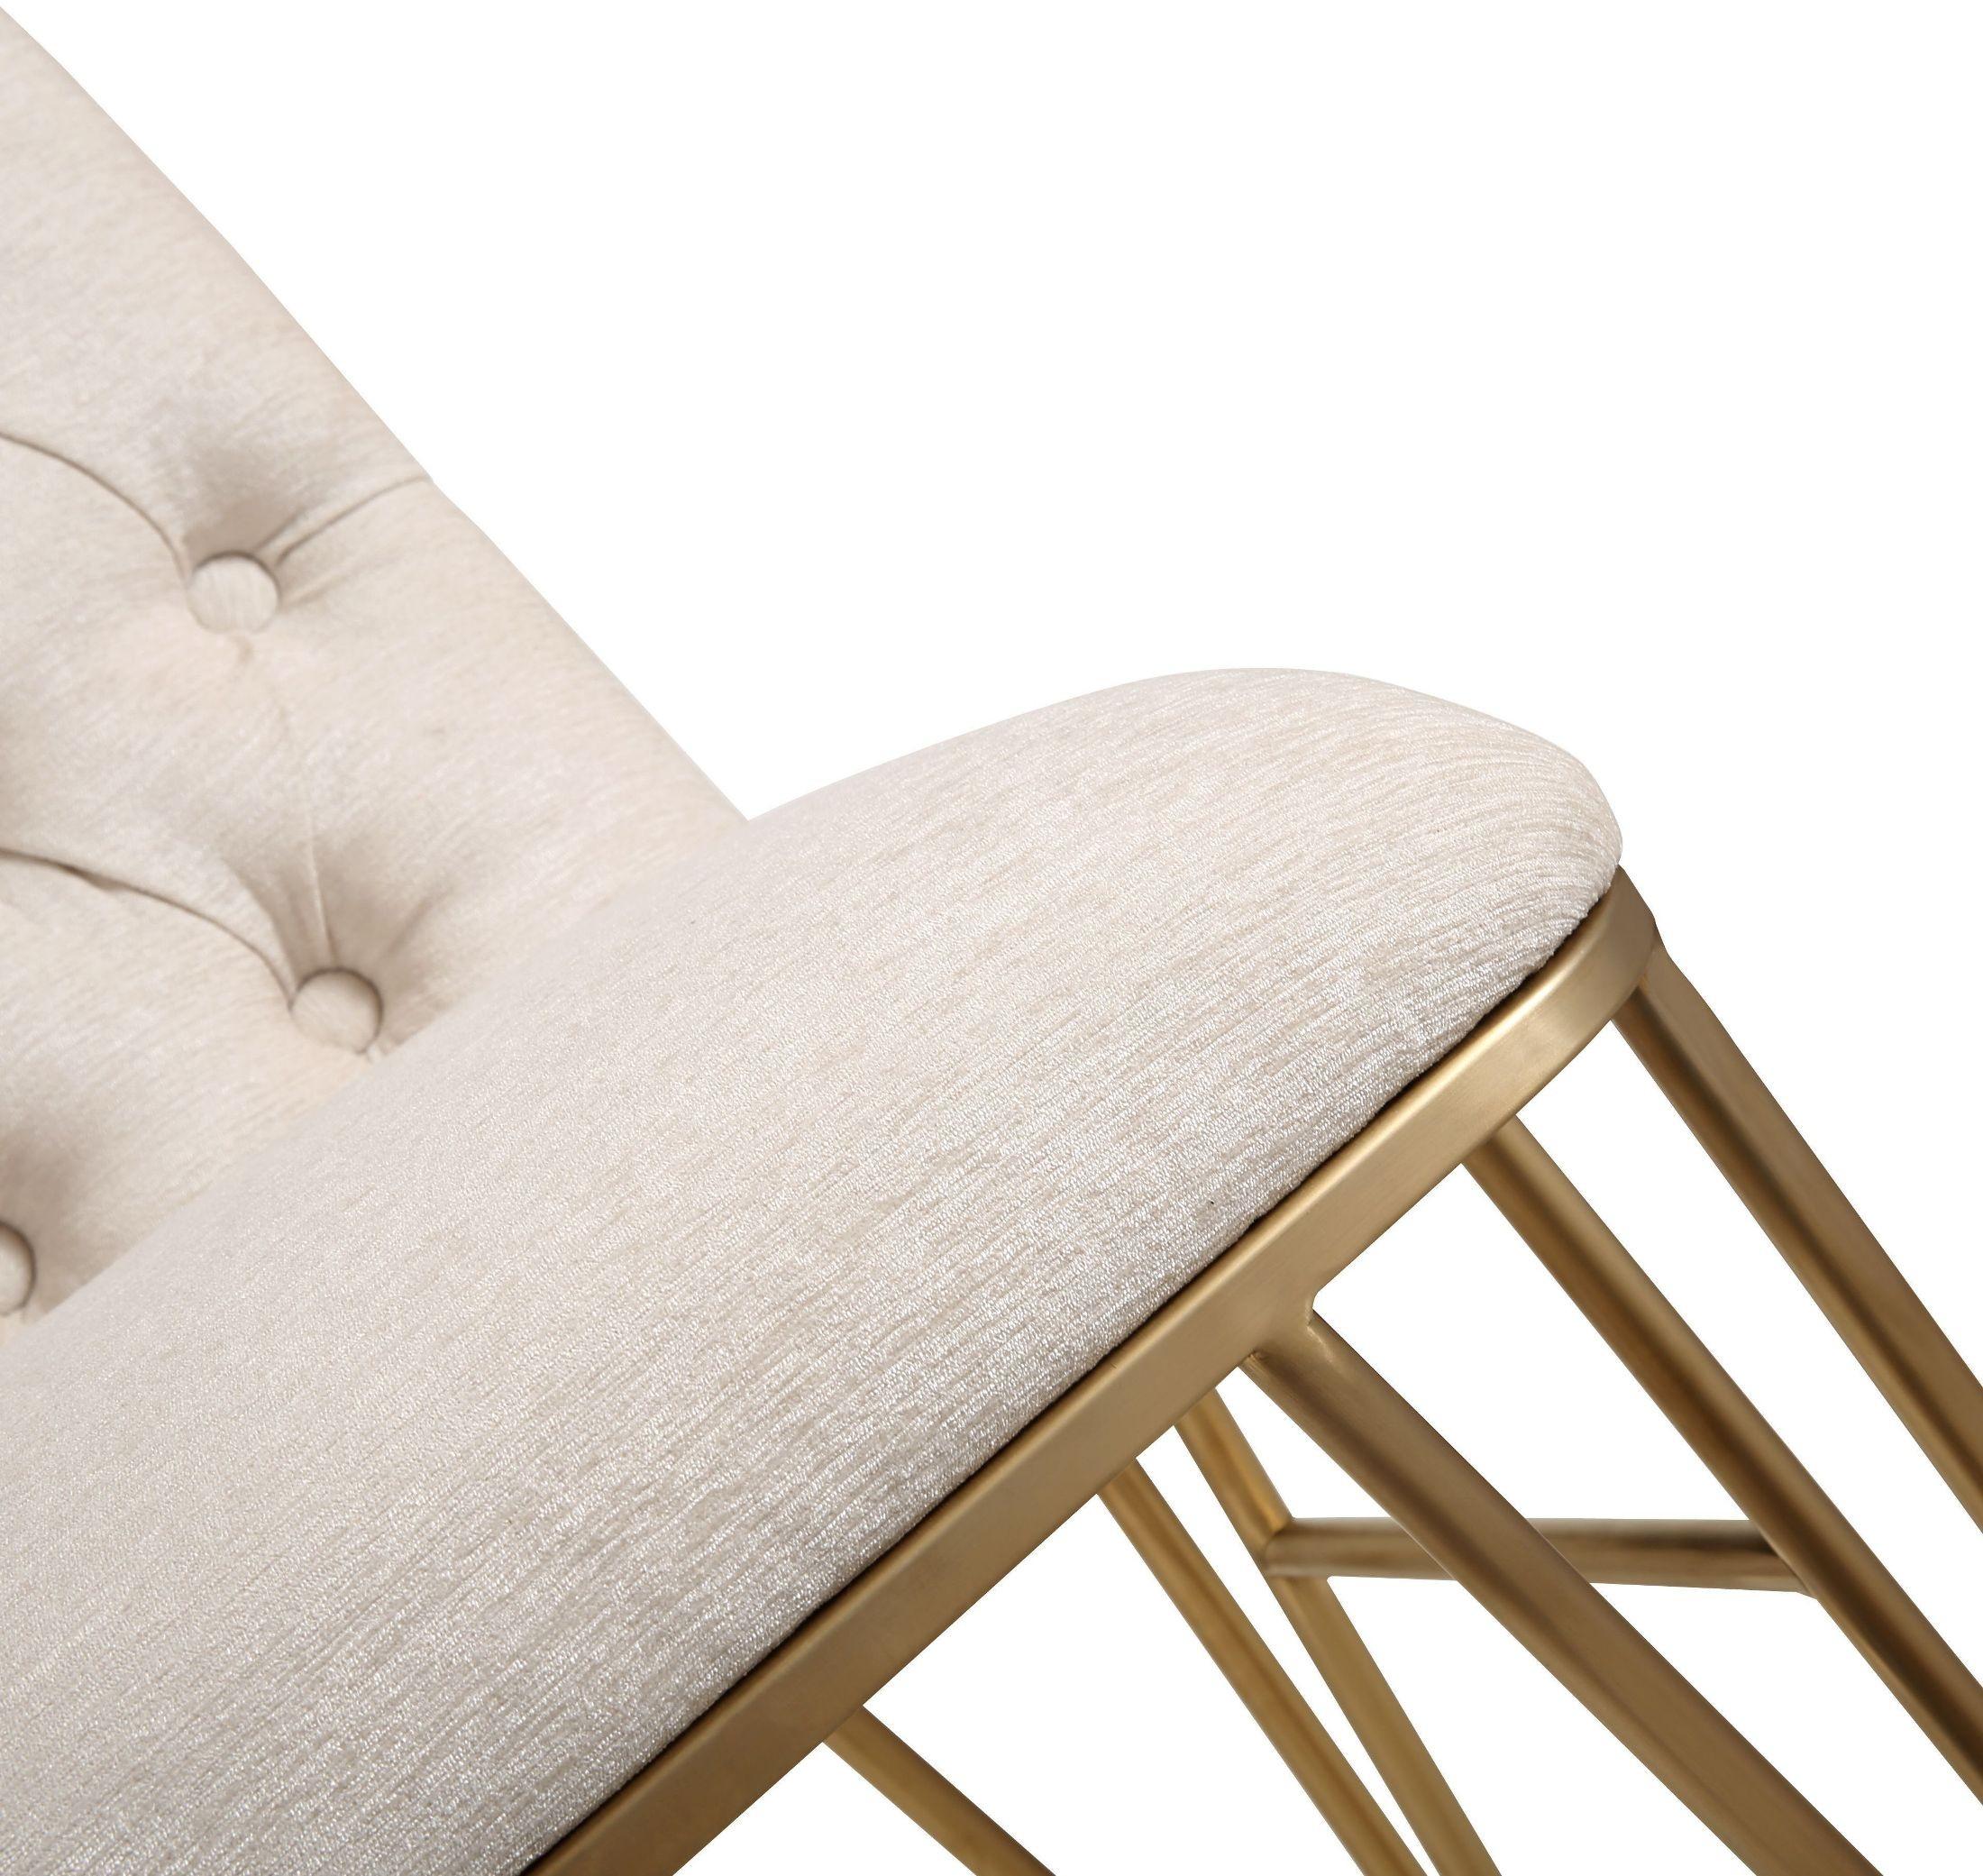 Lexi Cream Textured Velvet Bar Stool D3730 TOV Furniture : tov d37305tov from colemanfurniture.com size 2200 x 2081 jpeg 591kB